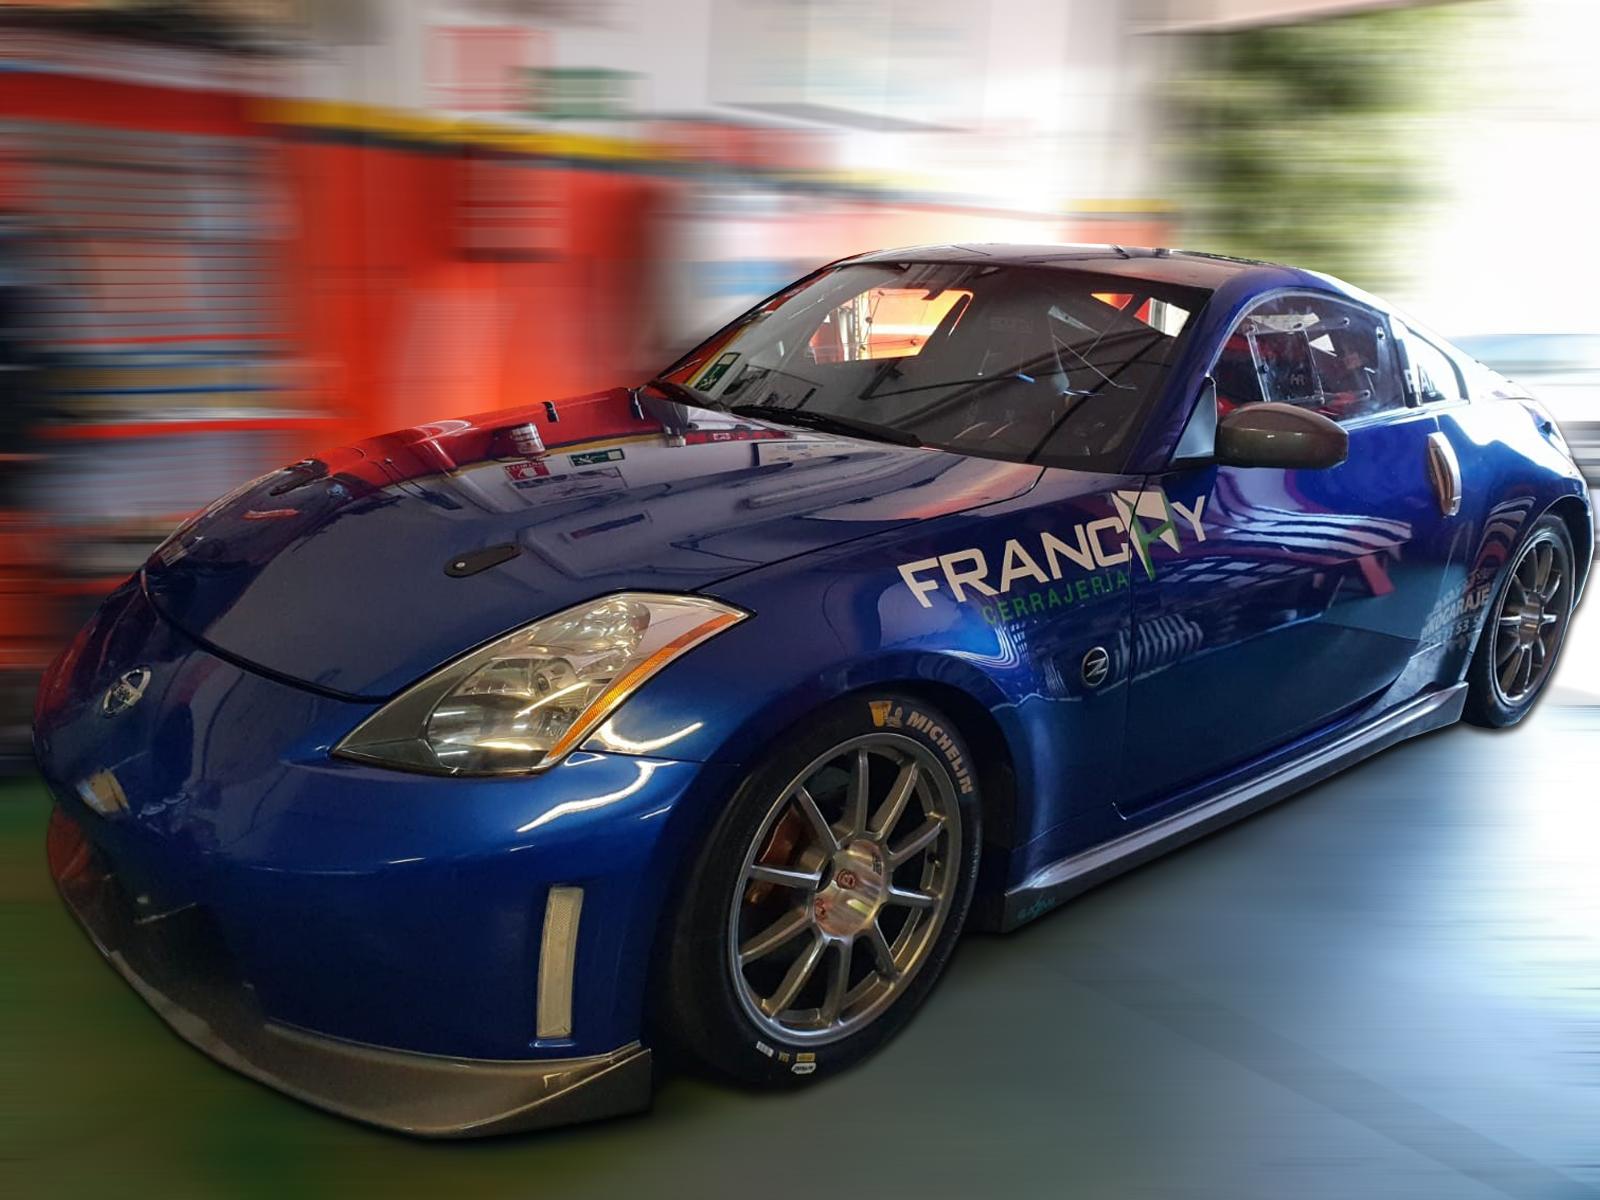 Llantas Braid Fullrace A Flowforming 9x18 - Nissan 350Z - Perseo Arbelo